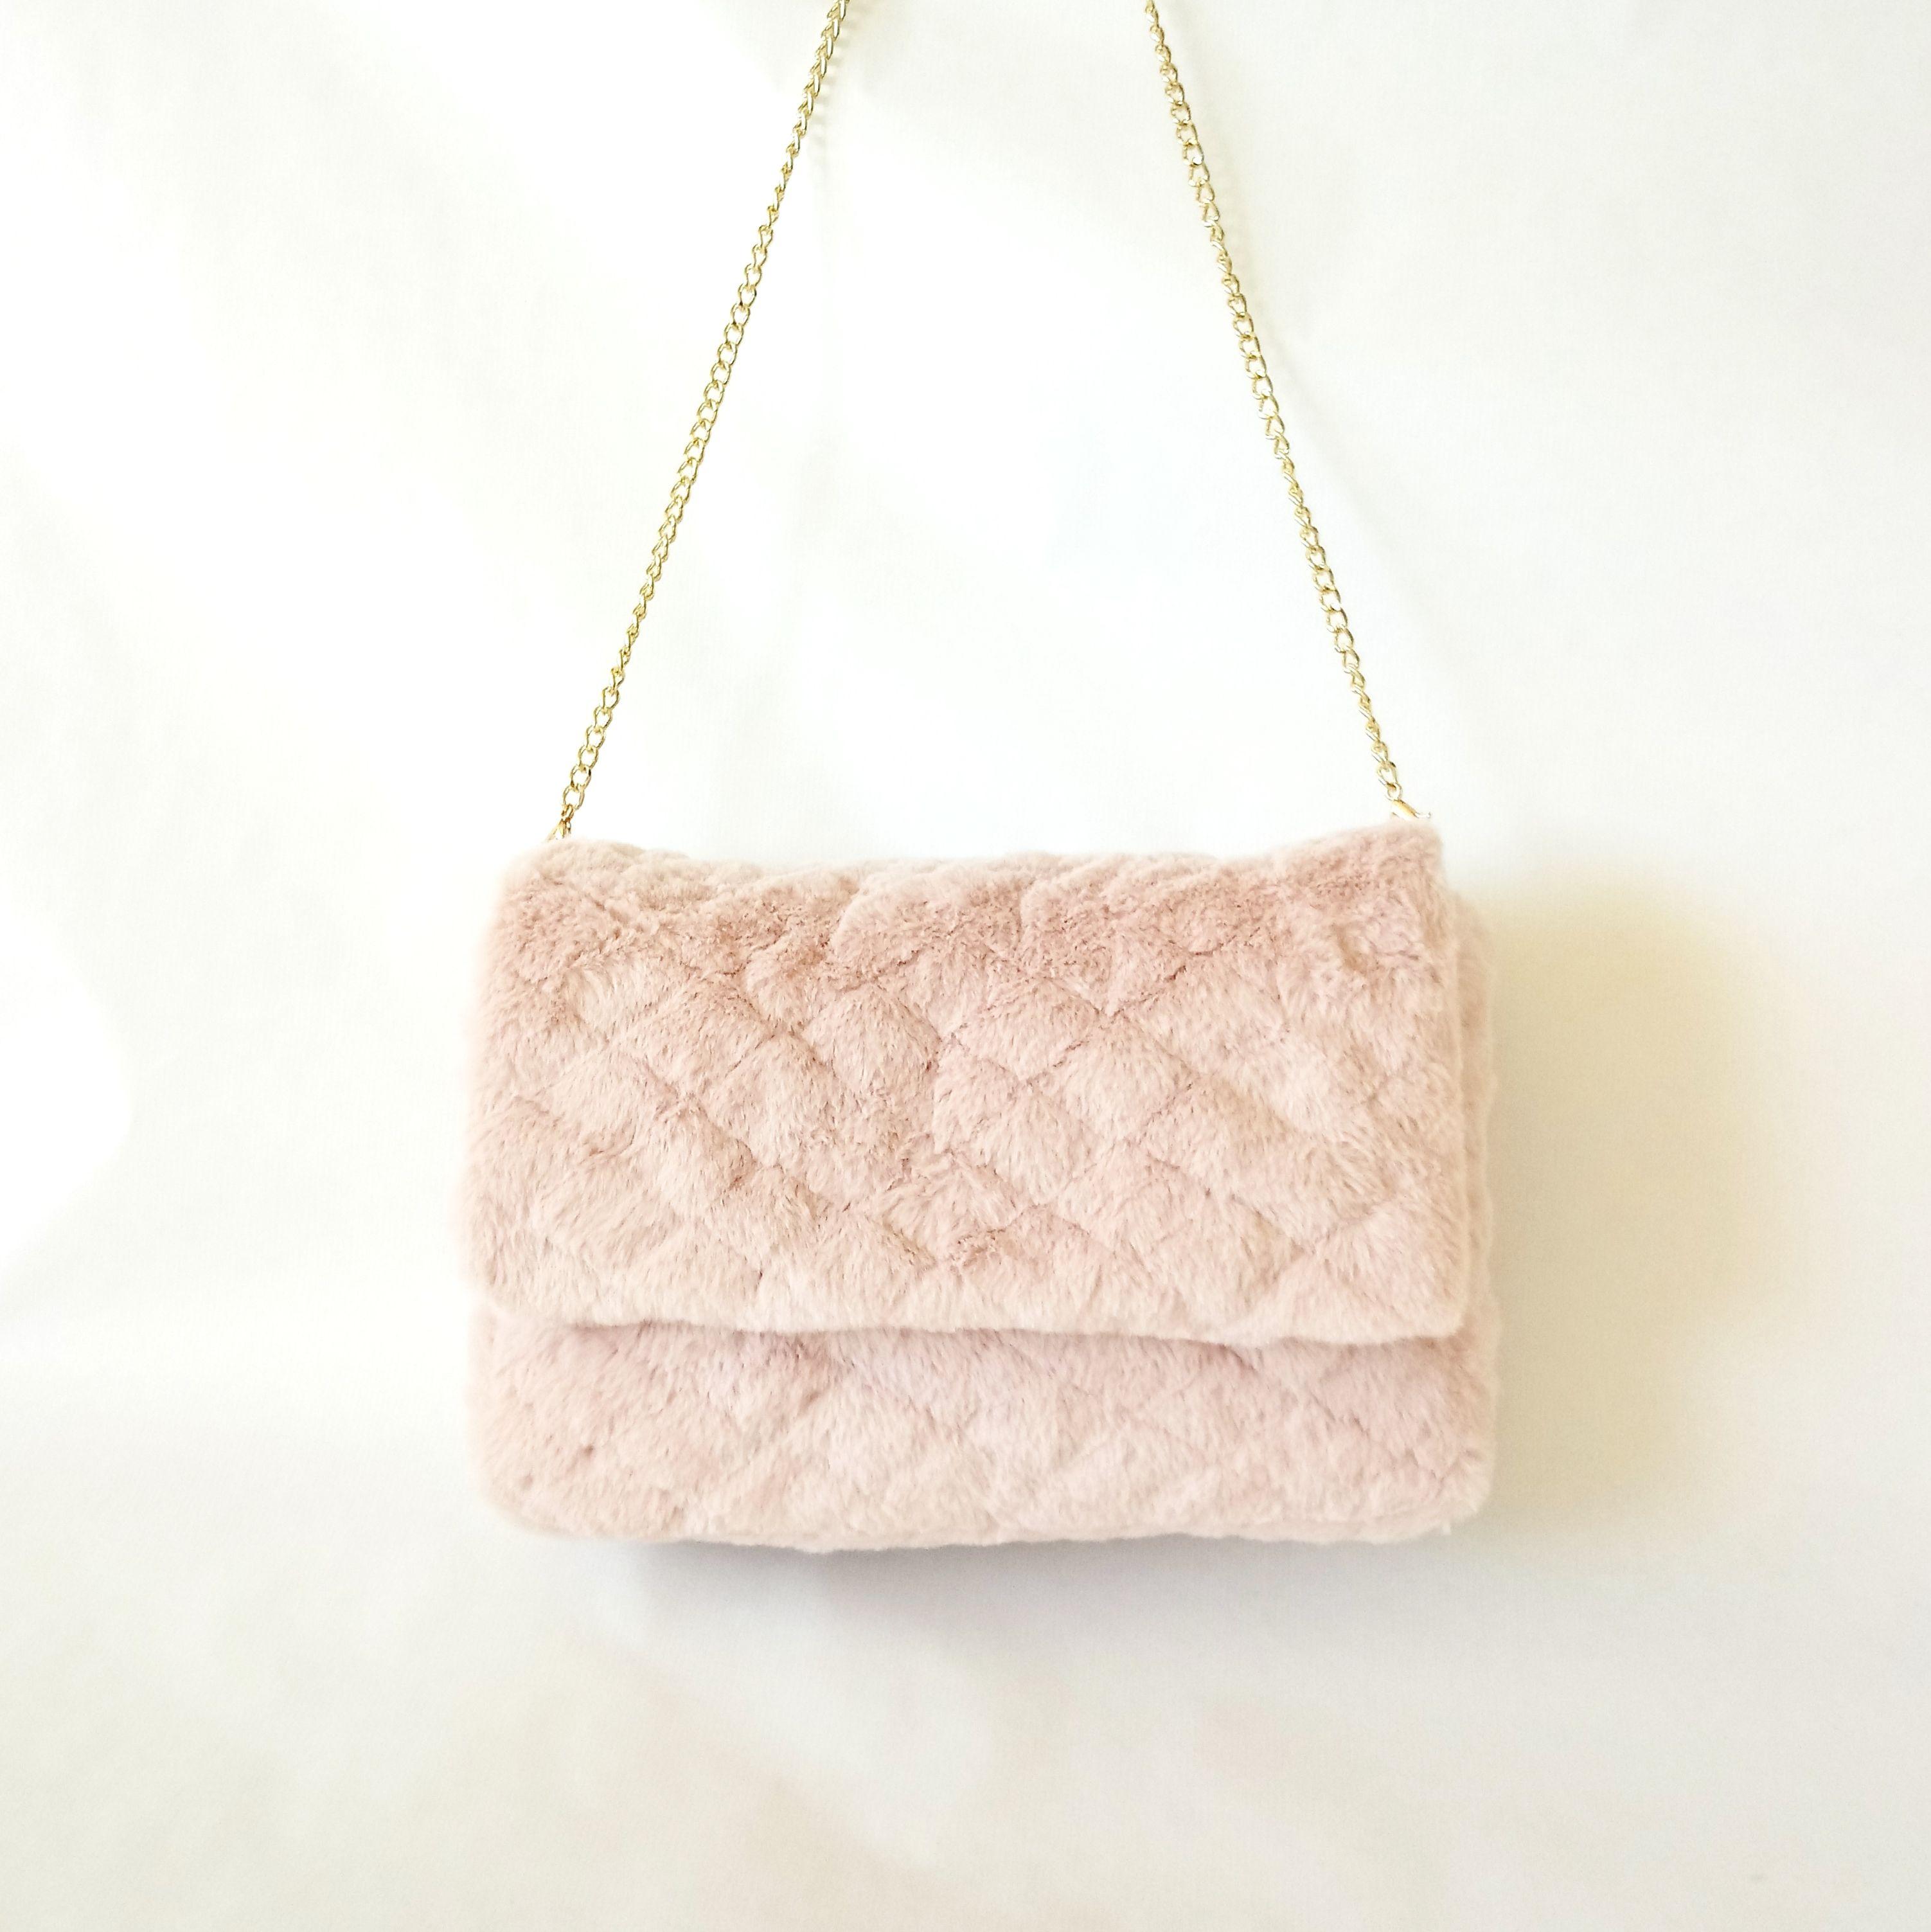 Épinglé sur joli sac